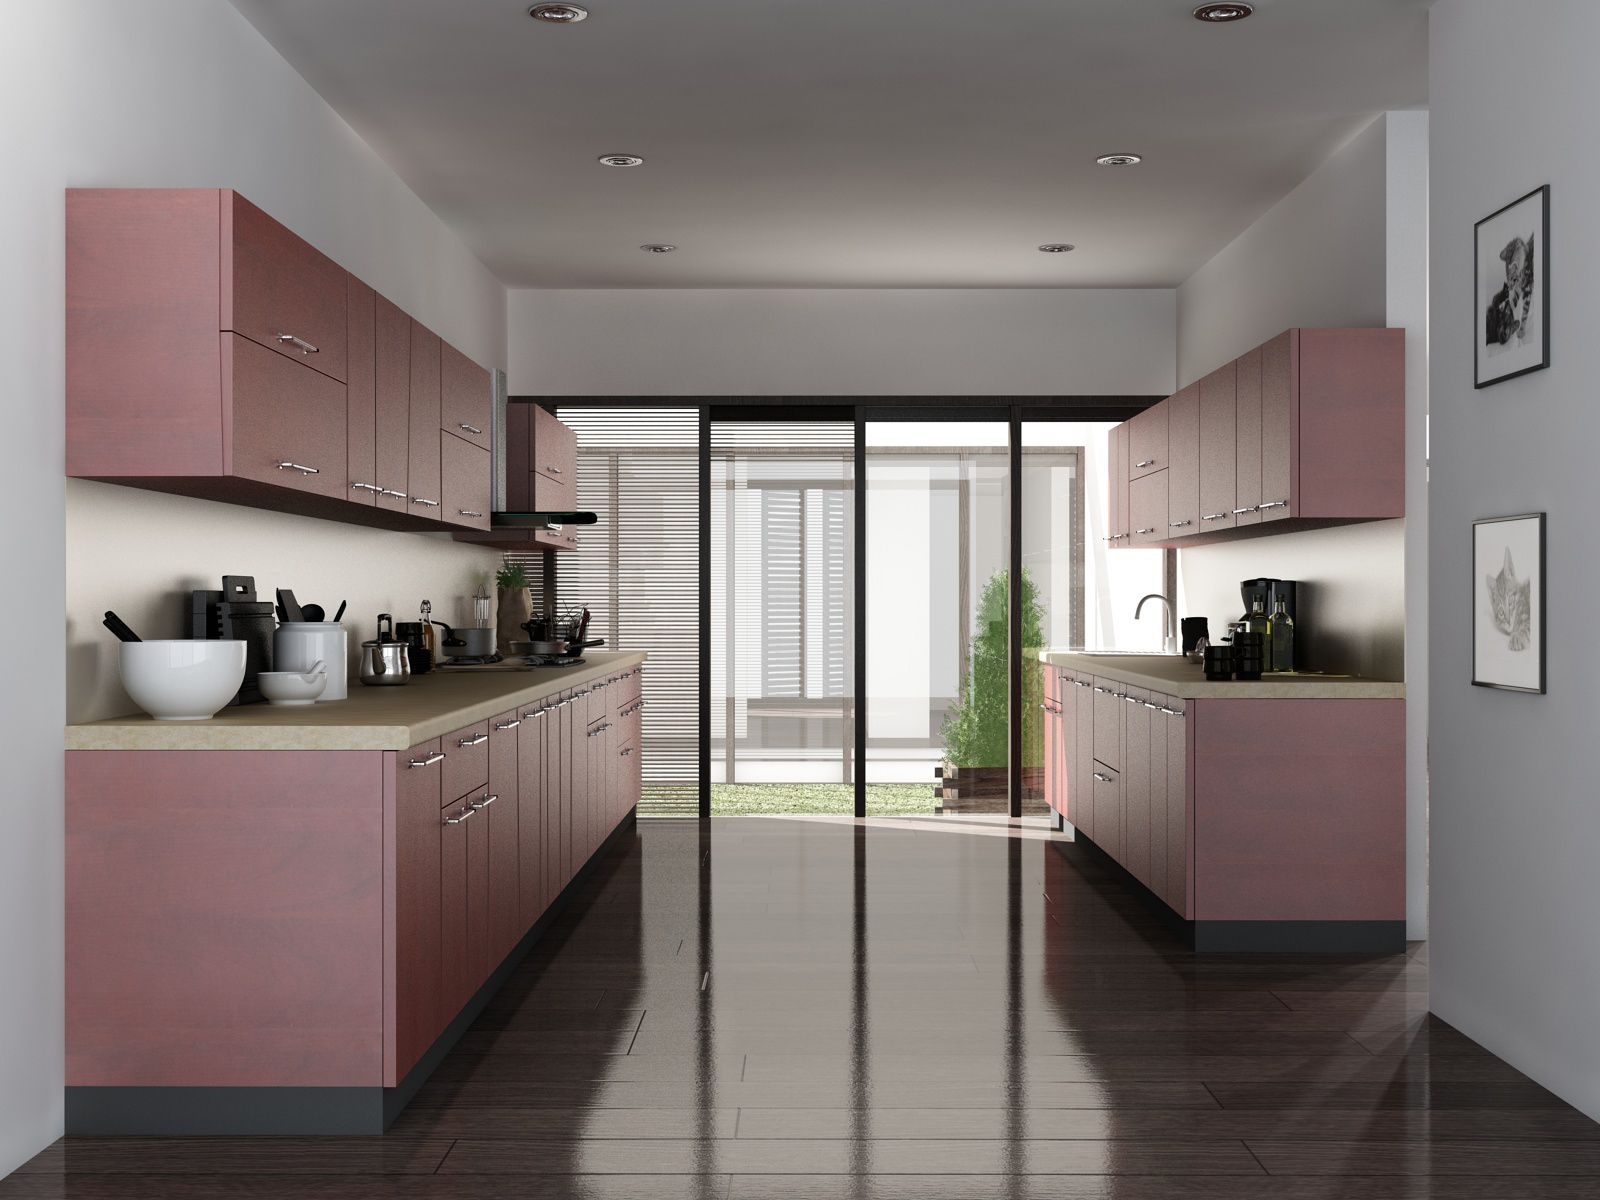 Parallele Kuchen Designs Fur Den Effizienten Kuchenverkehr Parallel Kitchen Design Kitchen Furniture Design Kitchen Designs Layout